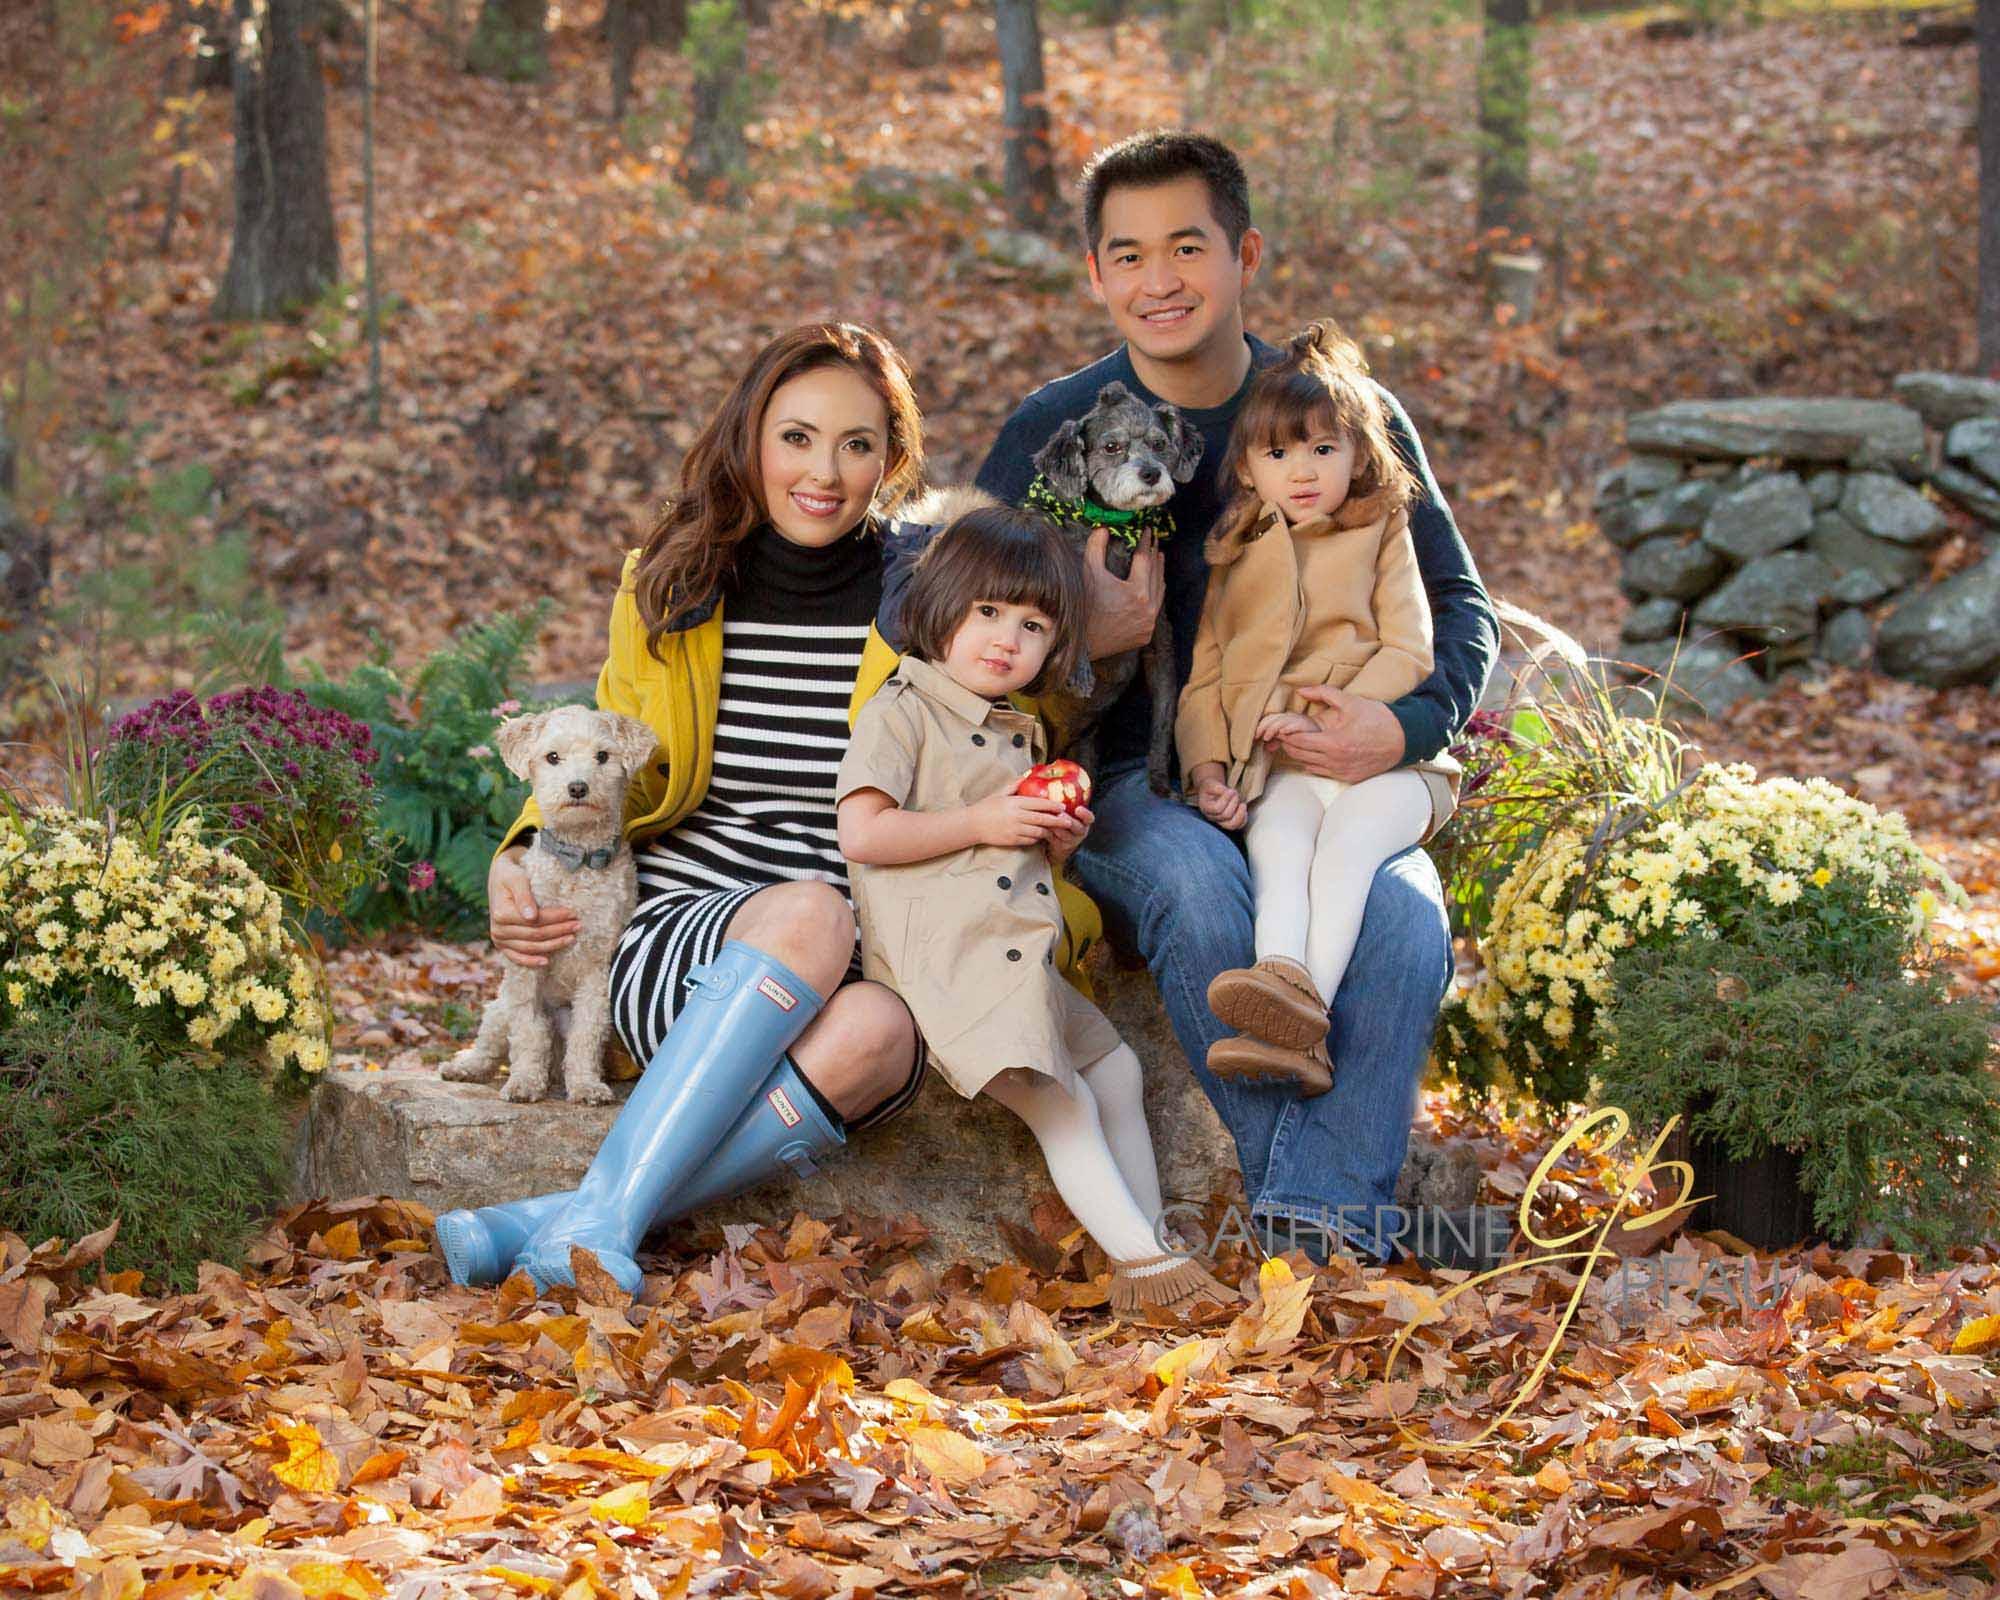 catherinepfauphotography_familyportrait_children_photography-10.jpg